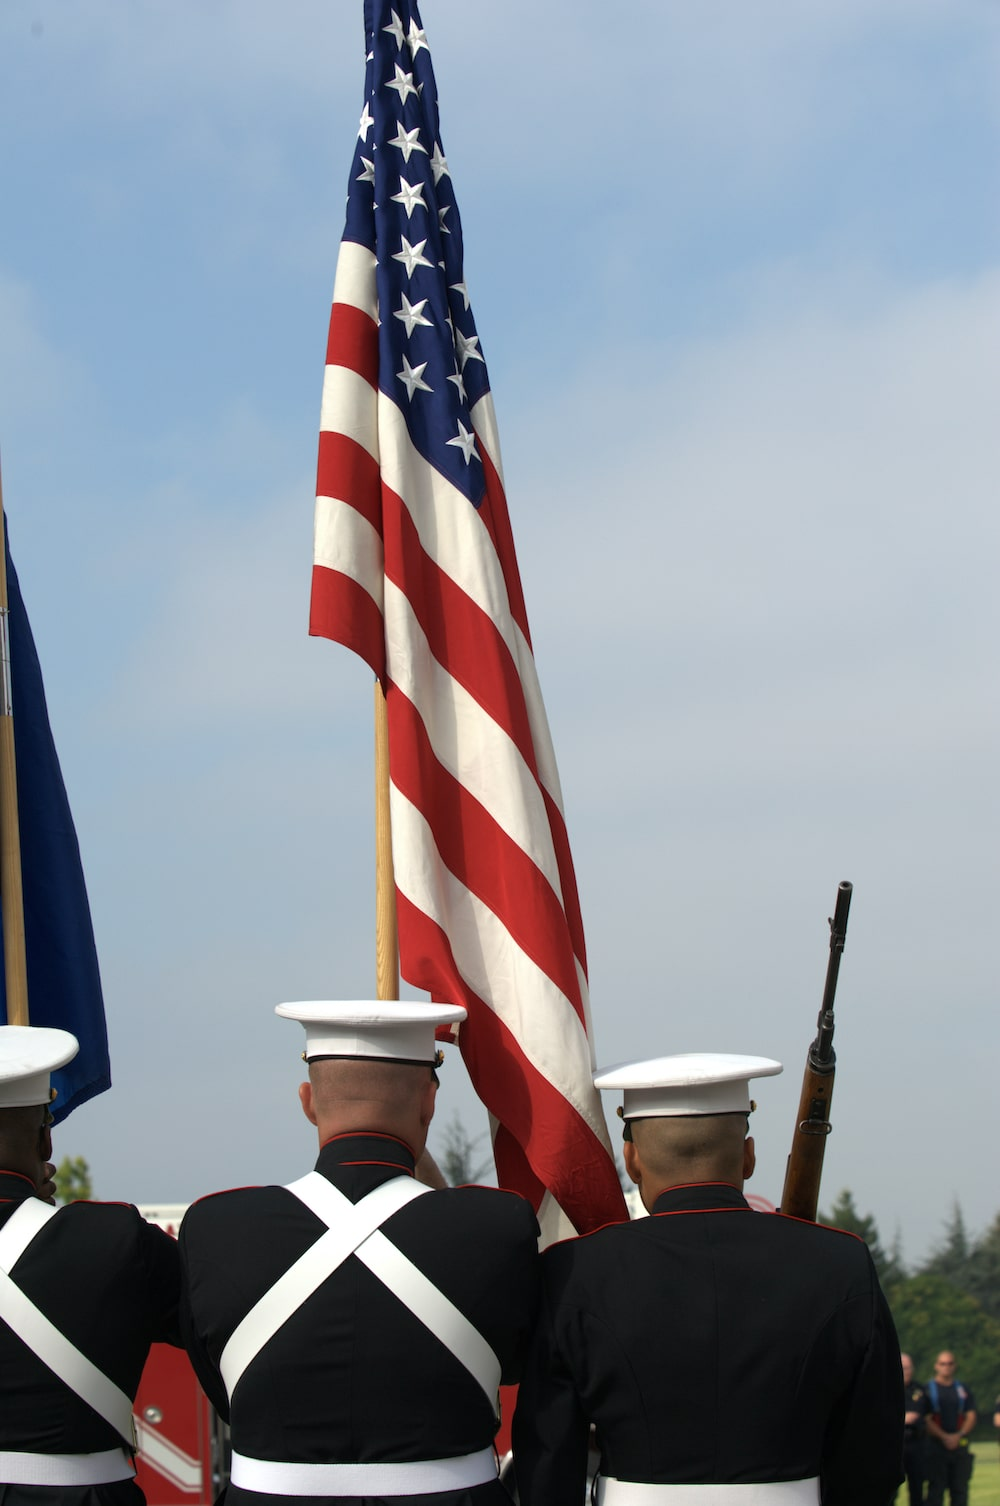 US military raising flag